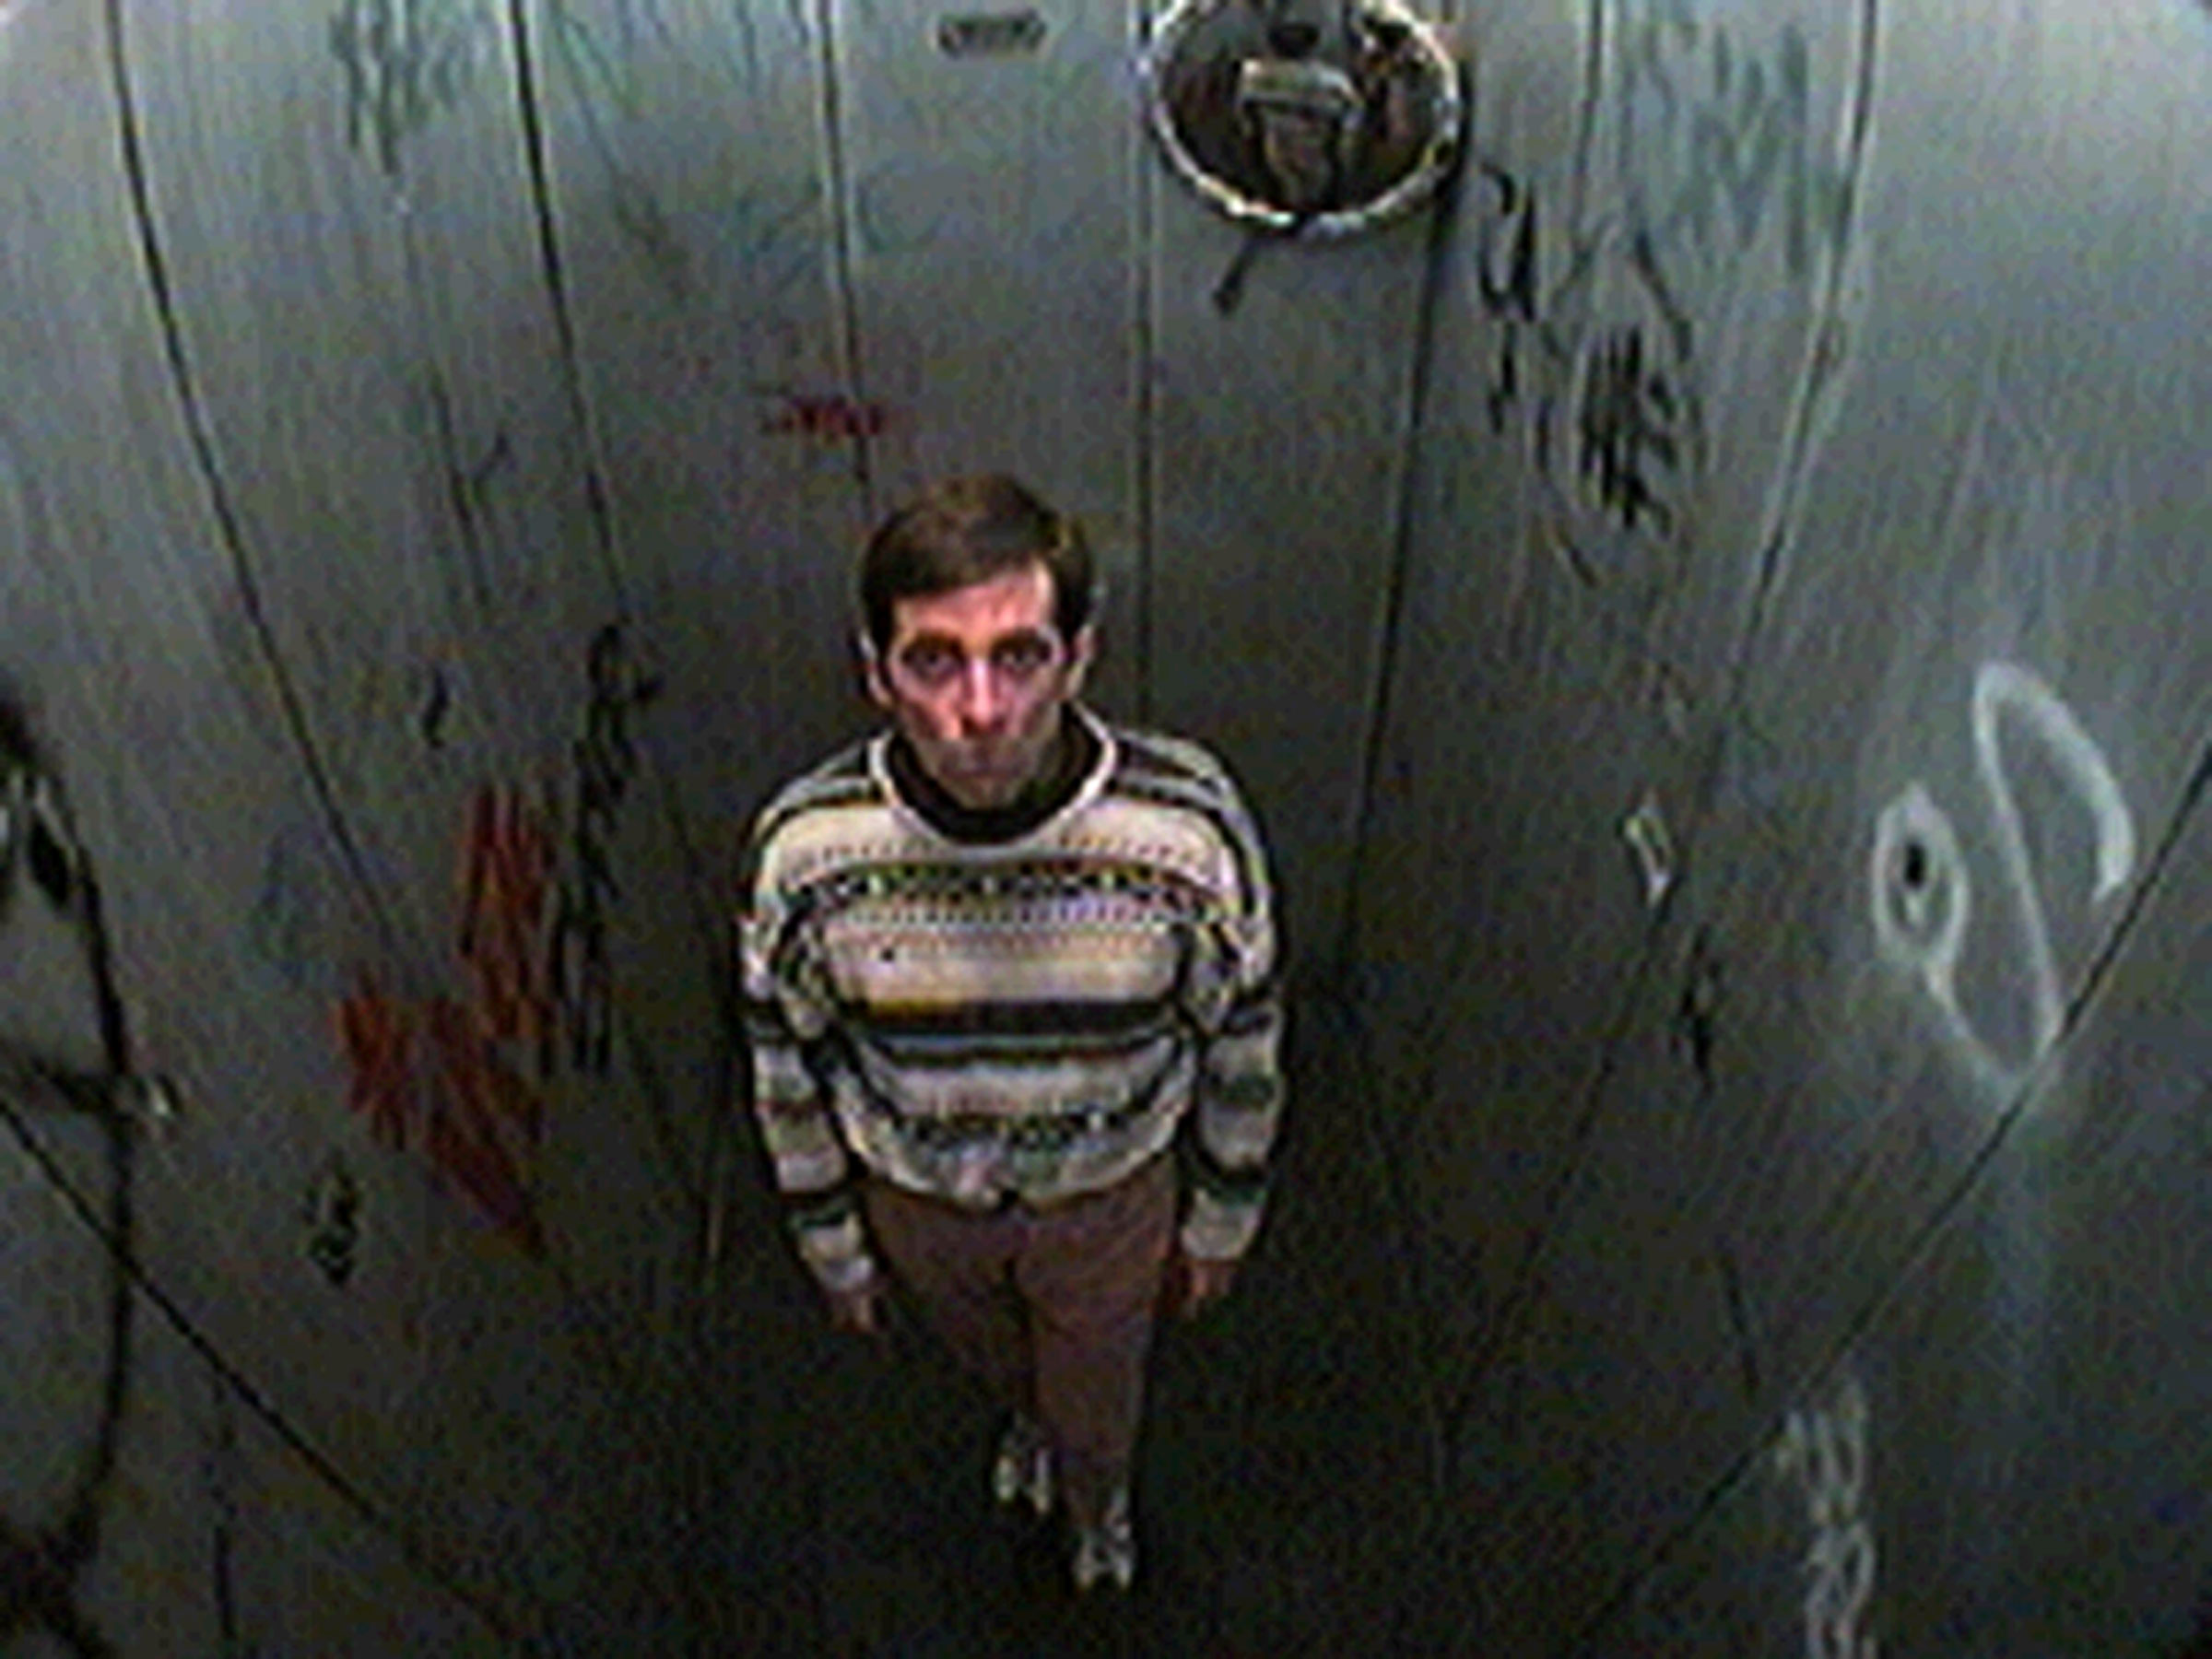 1997-06-12-SF-Broth-Surveillance-tv02-shaun